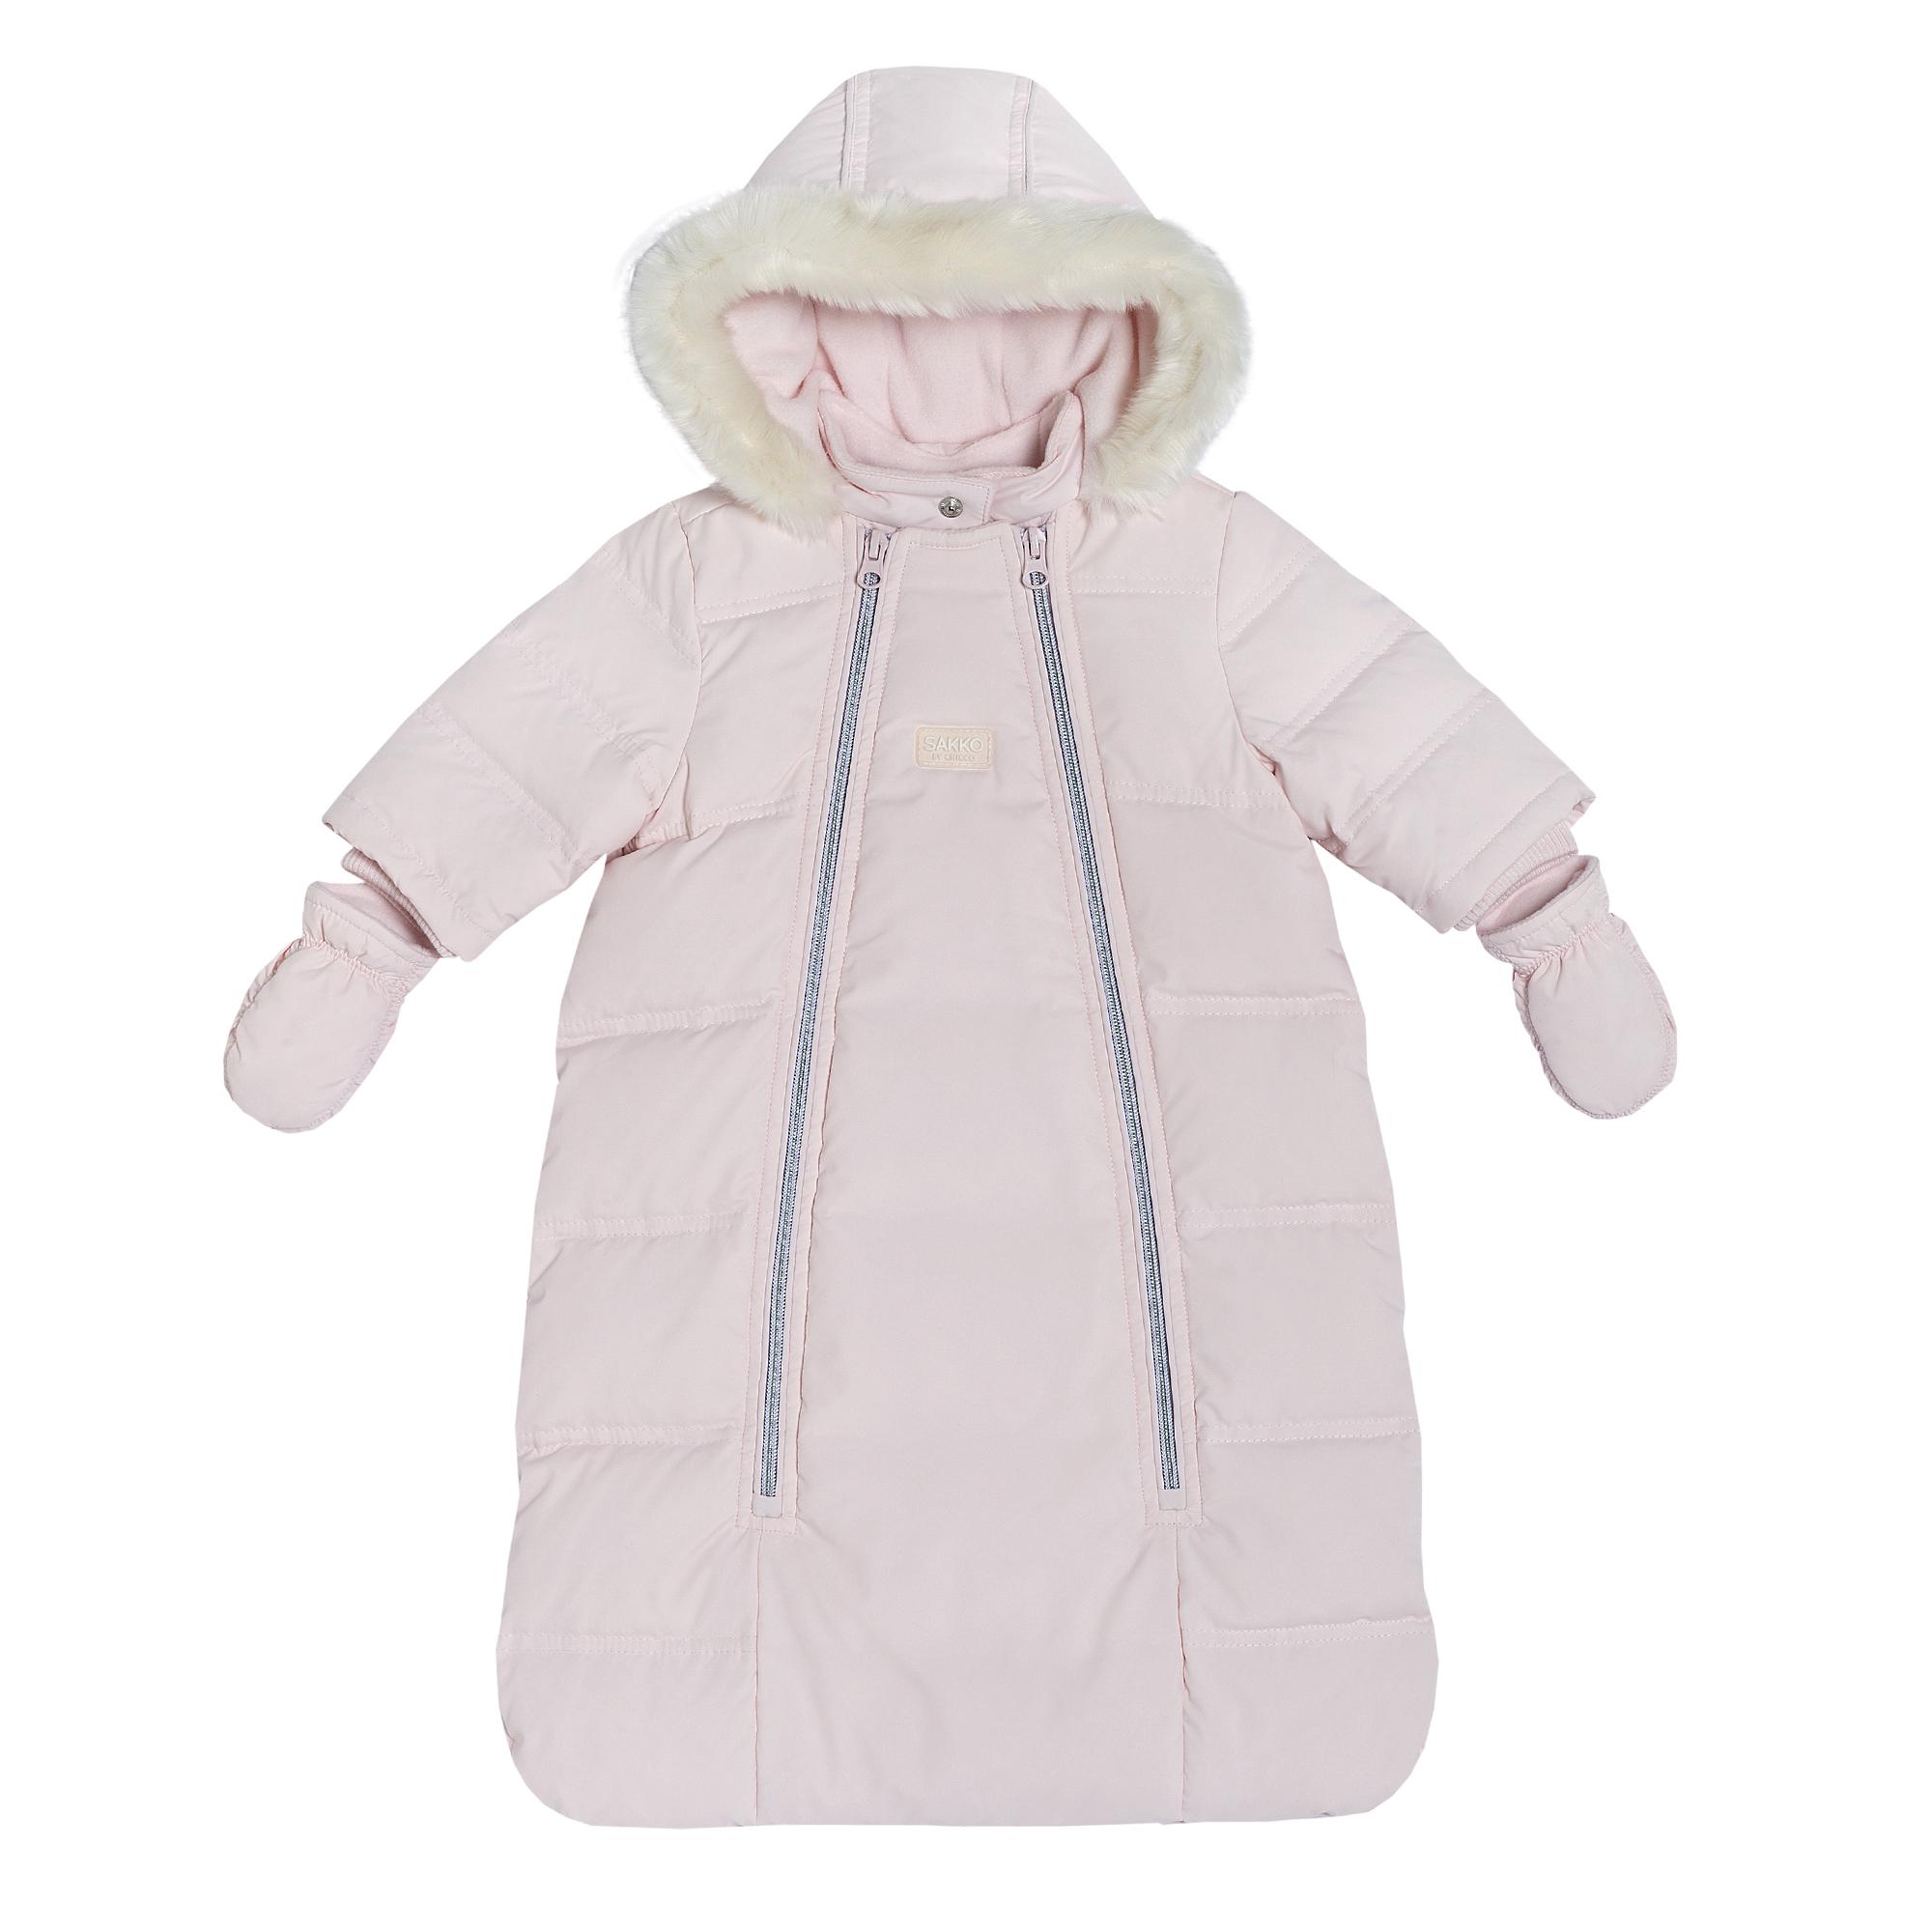 Sac De Dormit Pentru Copii Chicco Sakko, Roz, 27063 imagine